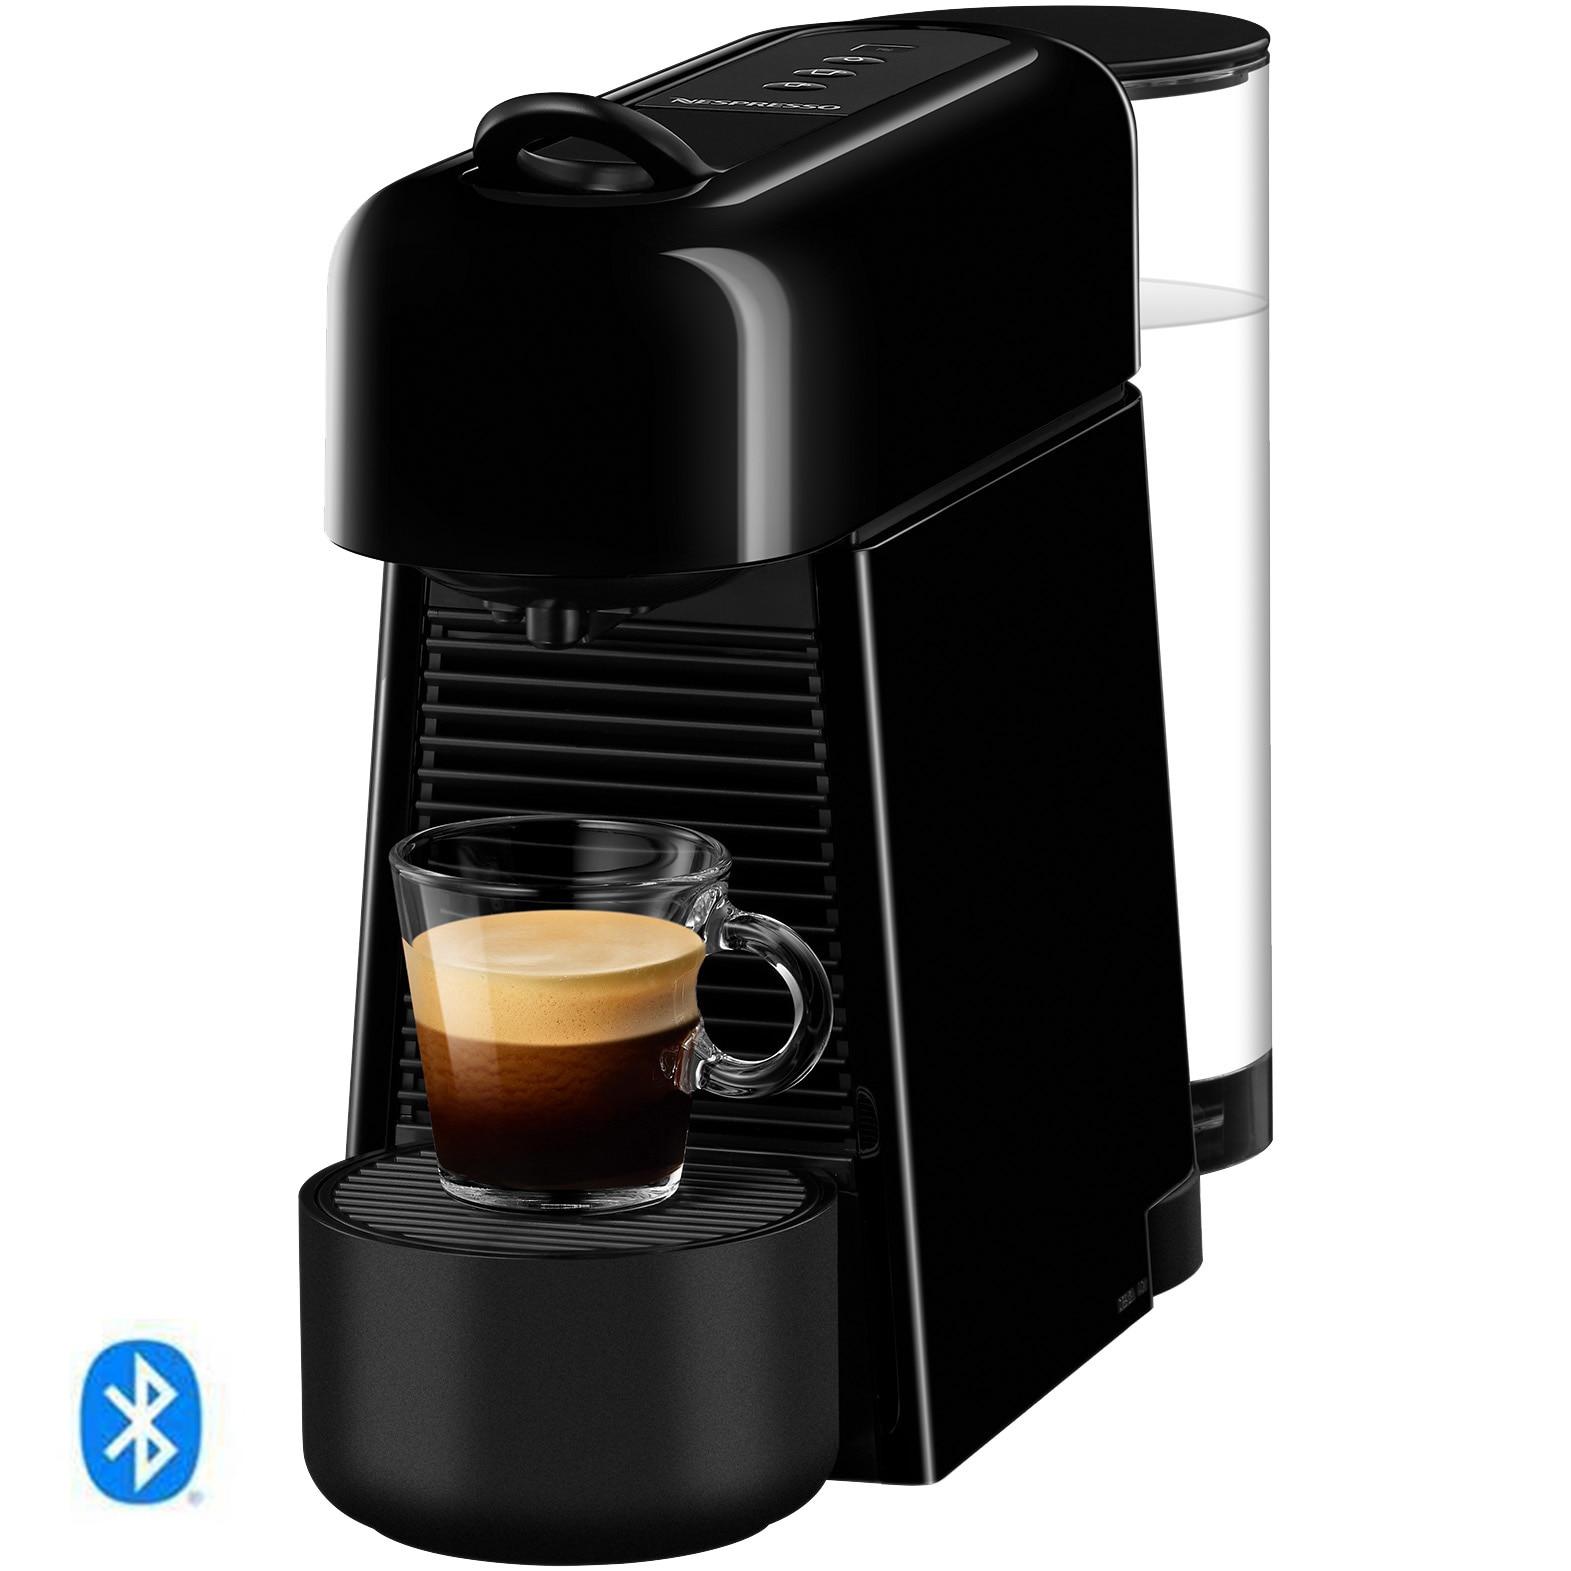 Fotografie Espressor Nespresso Essenza Plus D45, 1260 W, 19 bar, functie BLUETOOTH, 1 L, A+, Negru